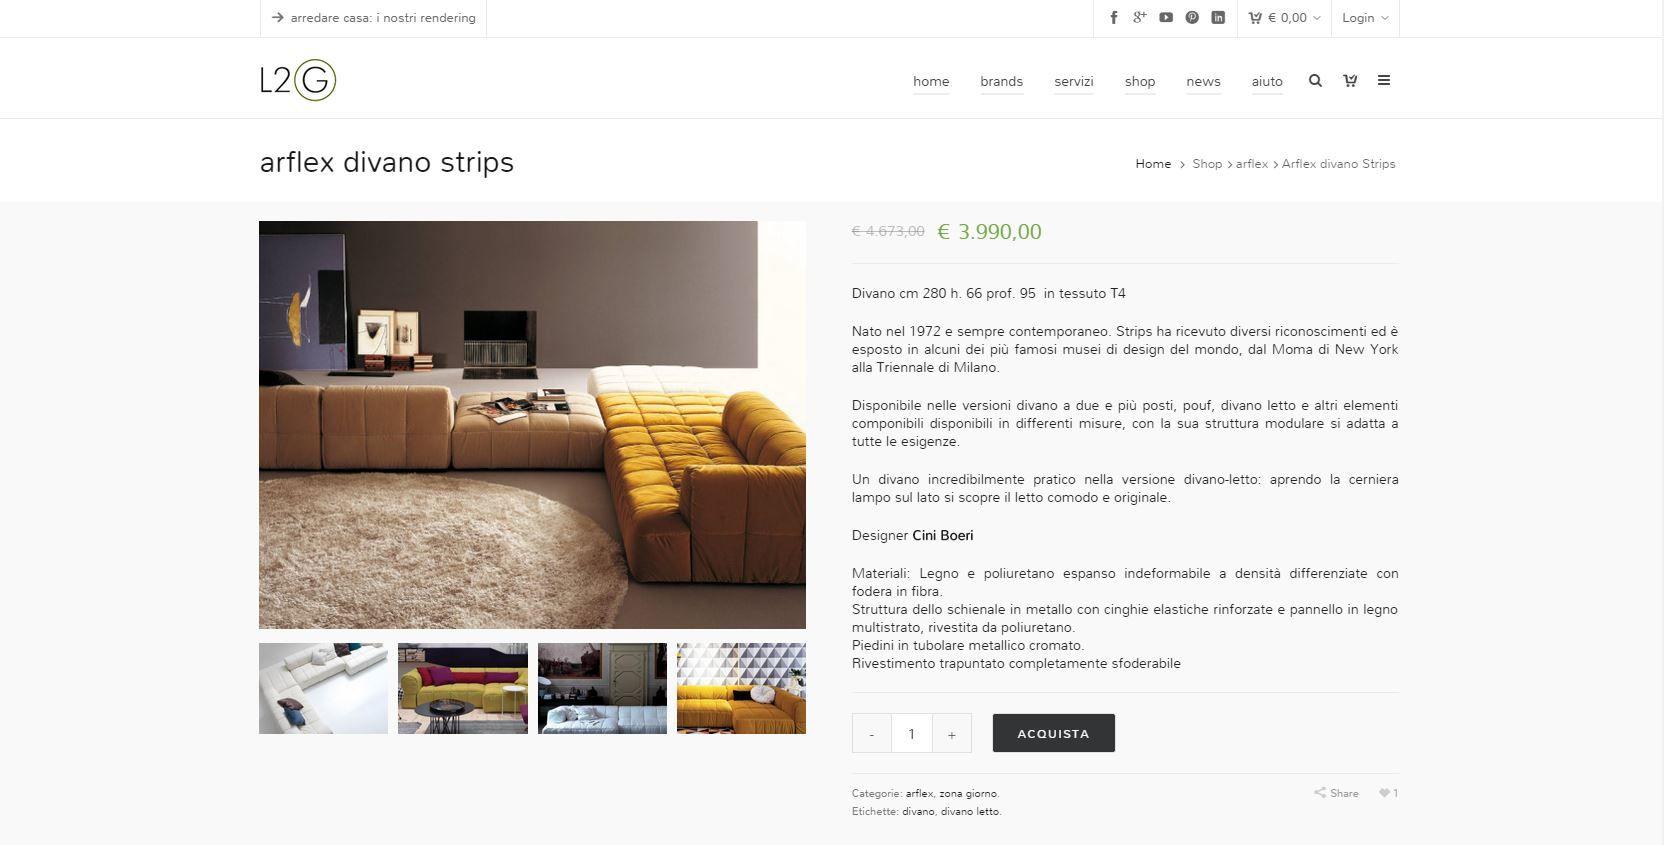 L2G shop: dal rendering al luxury tour_divano_MilanoPlatinum